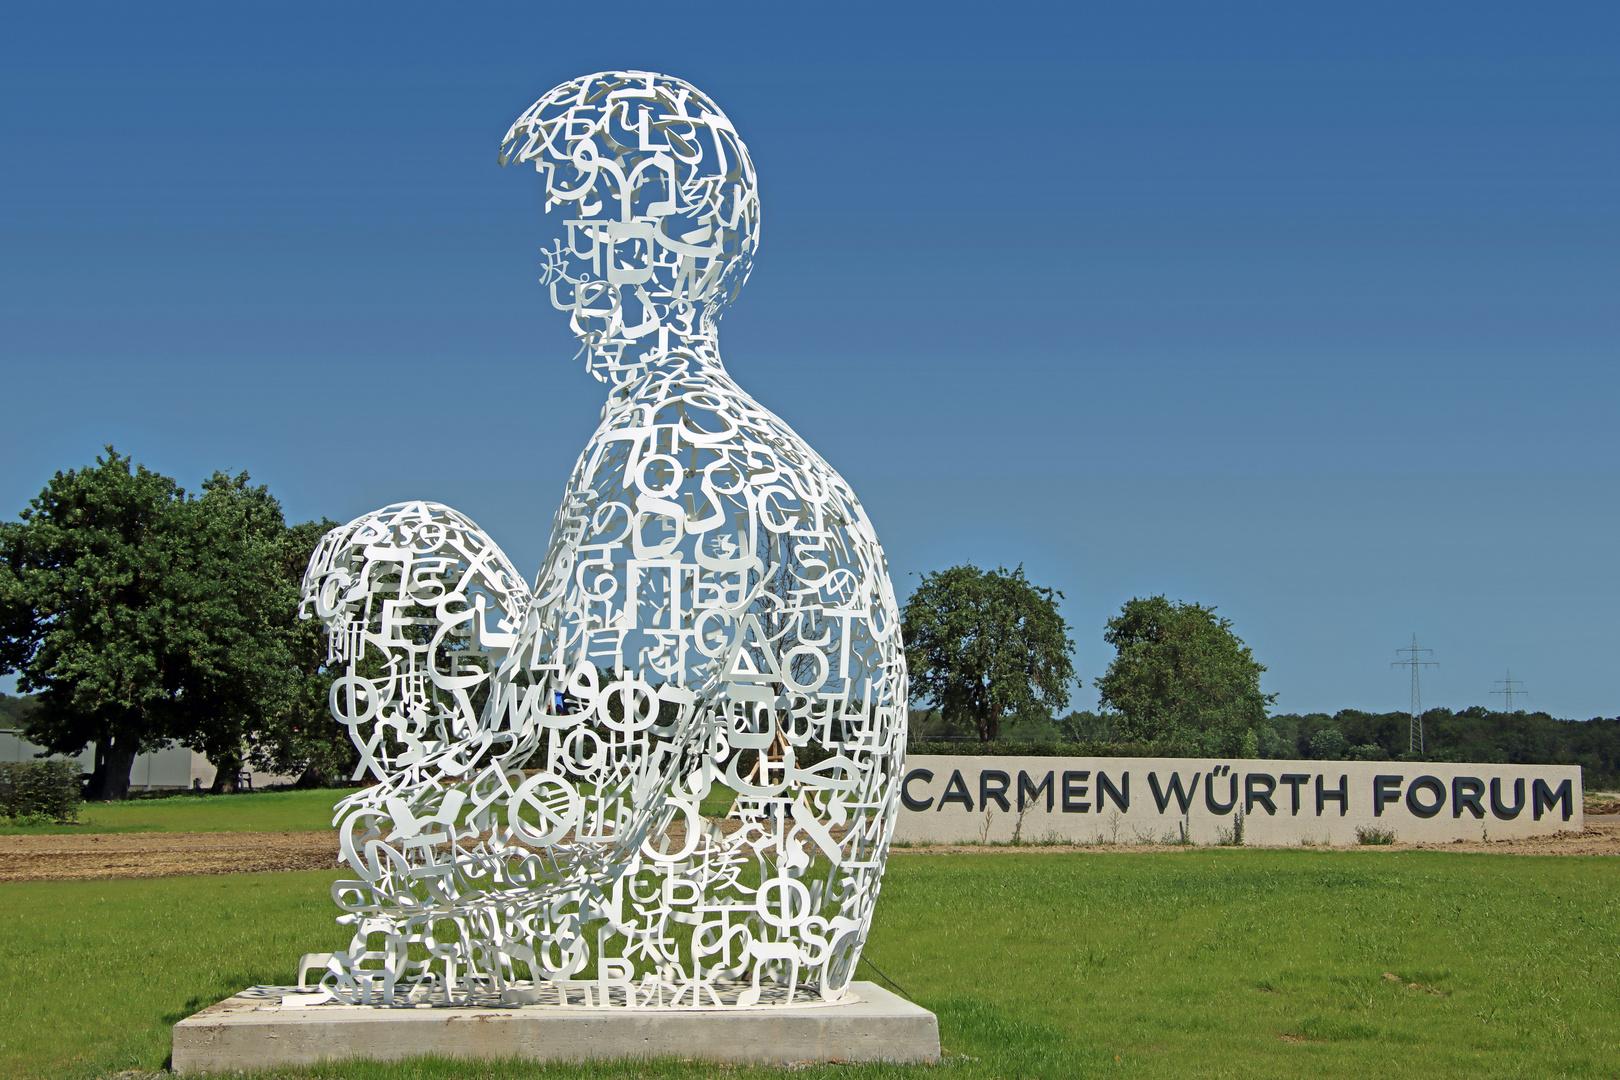 Carmen Würth Forum, Gaisbach